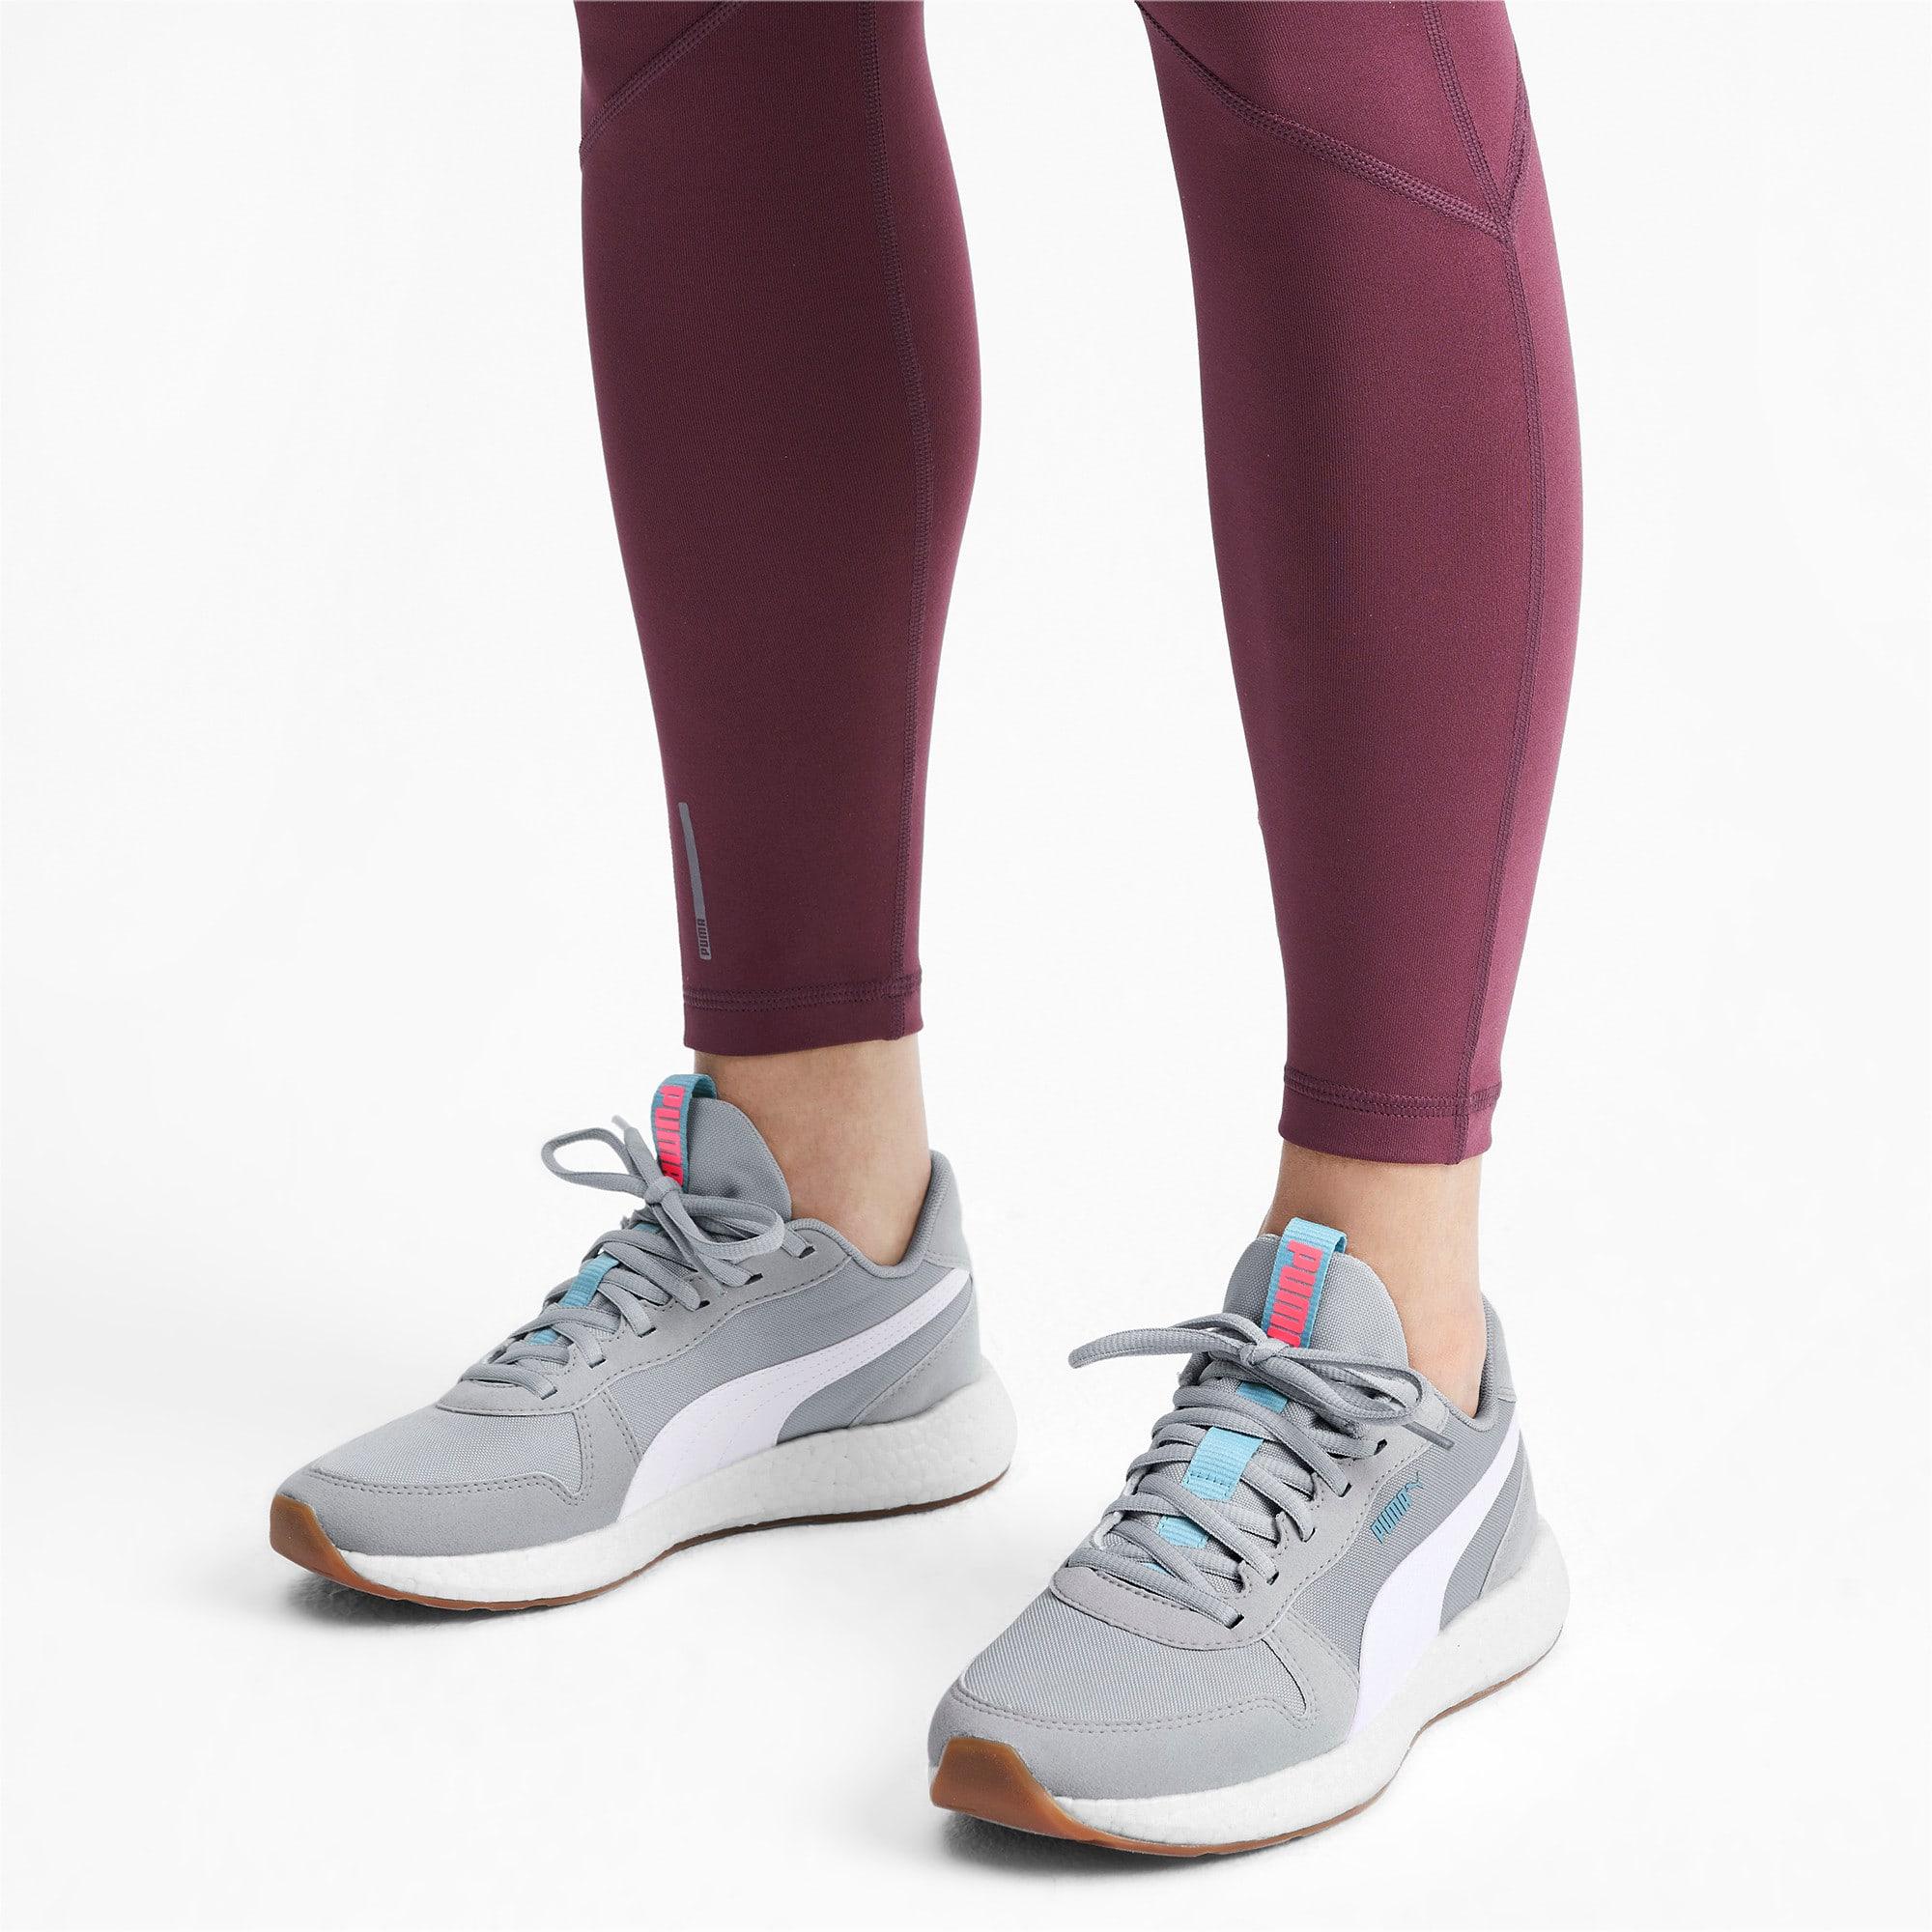 Thumbnail 2 of NRGY Neko Retro Women's Running Shoes, High Rise-Pink Alert, medium-IND